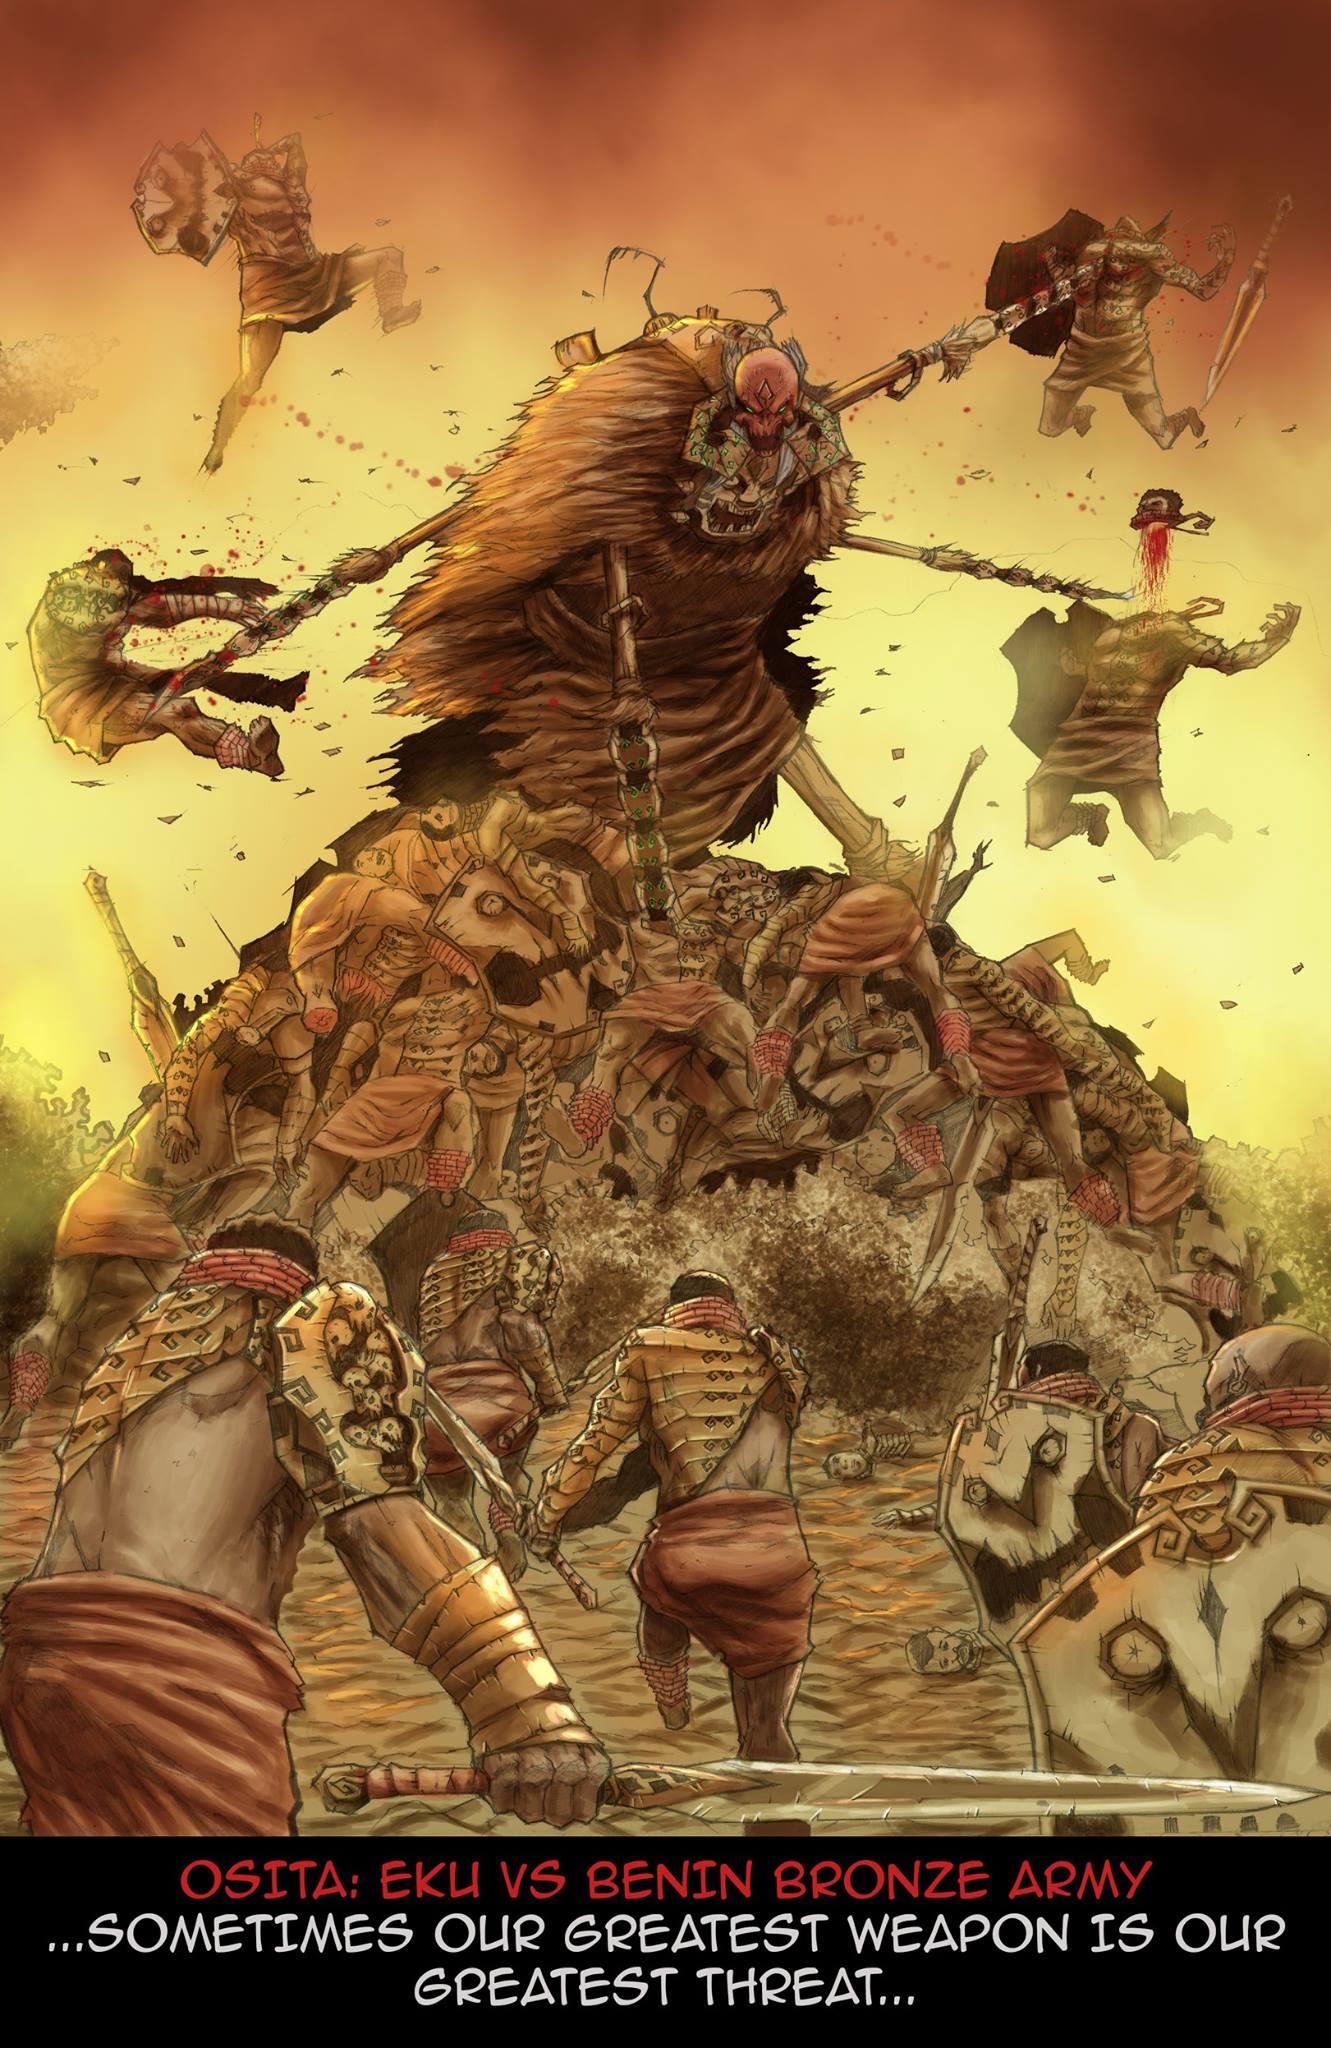 Osita by Mad! Comics. Written by Hafeez Oluwa